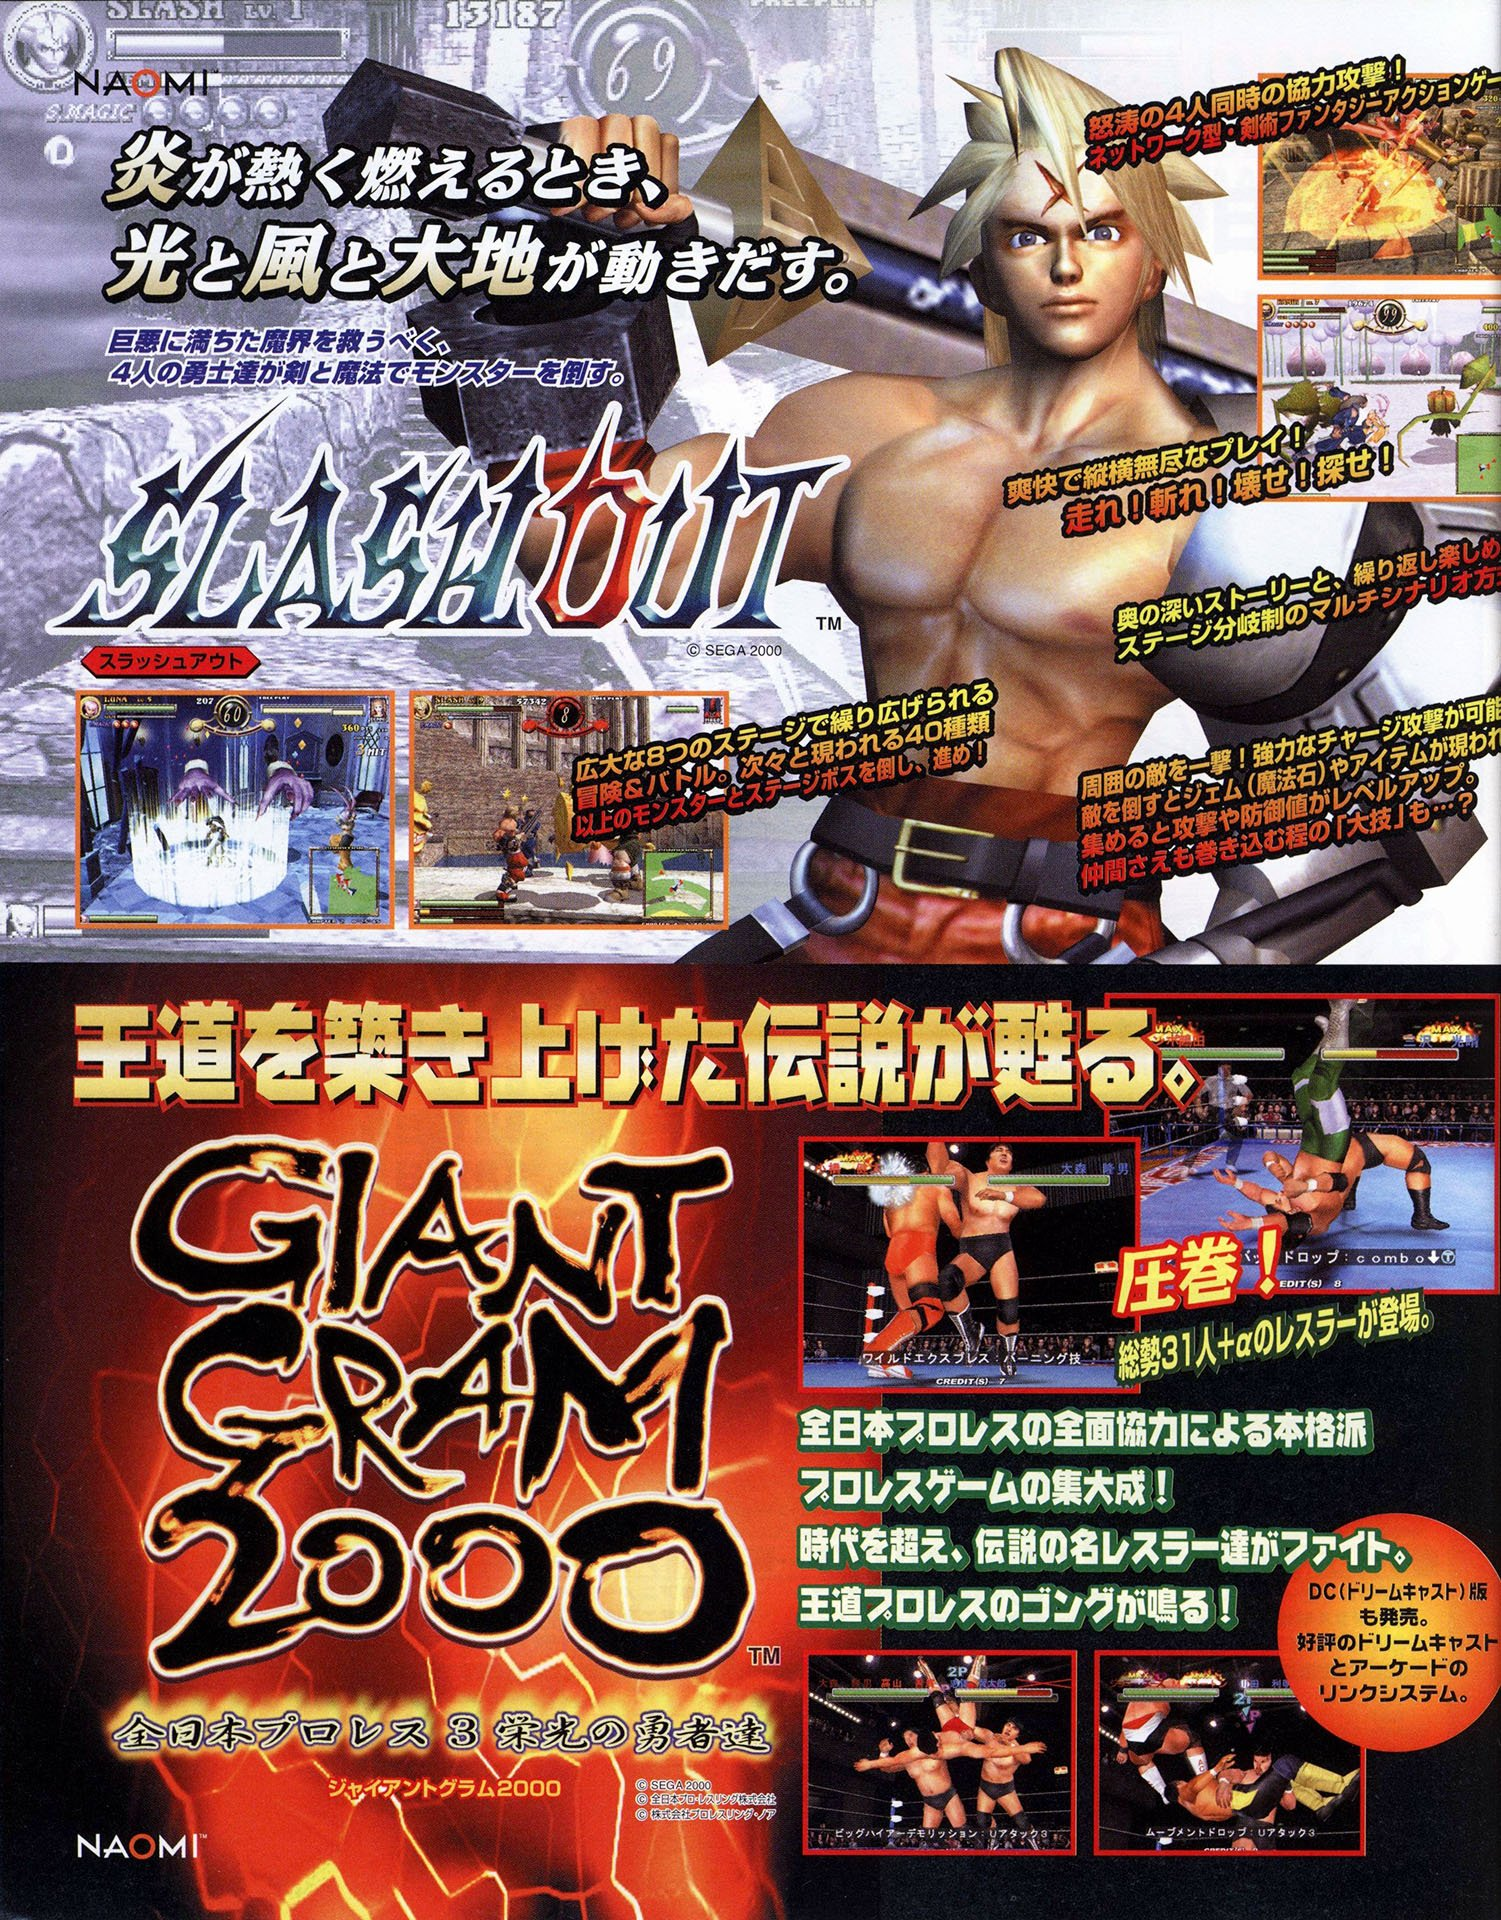 Slashout, Giant Gram 2000